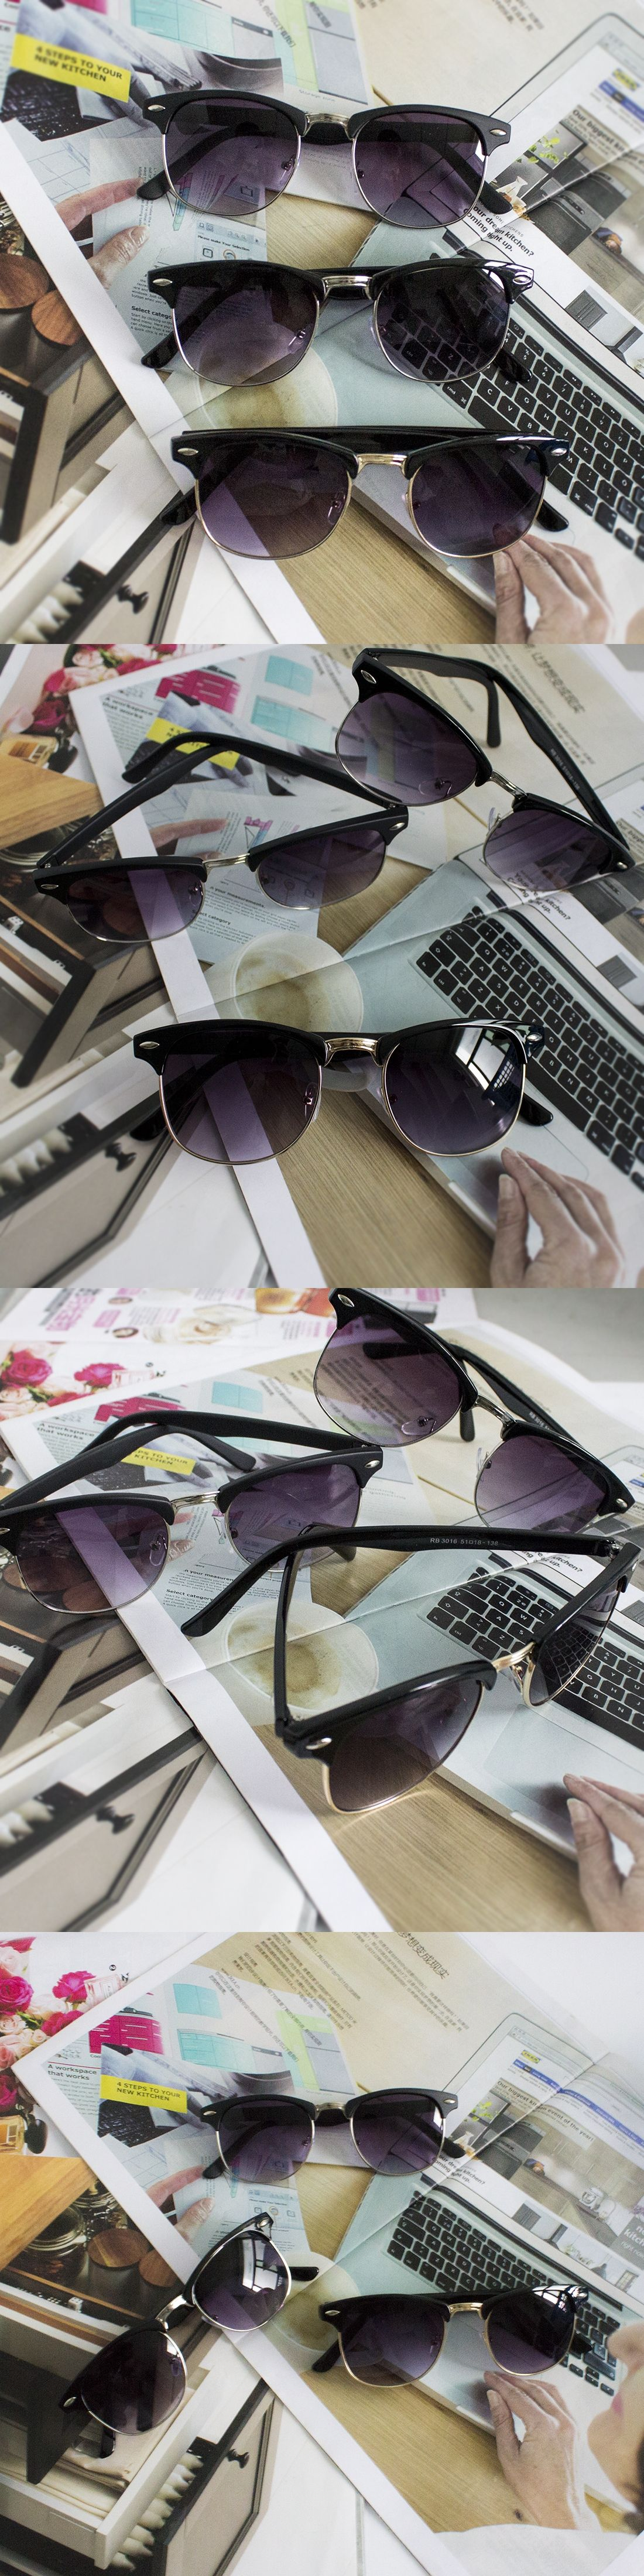 8c0d658346c8d Hot Sale High Quality Half Metal Sunglasses Men Women Brand Designer Glasses  Mirror Sun Glasses Fashion